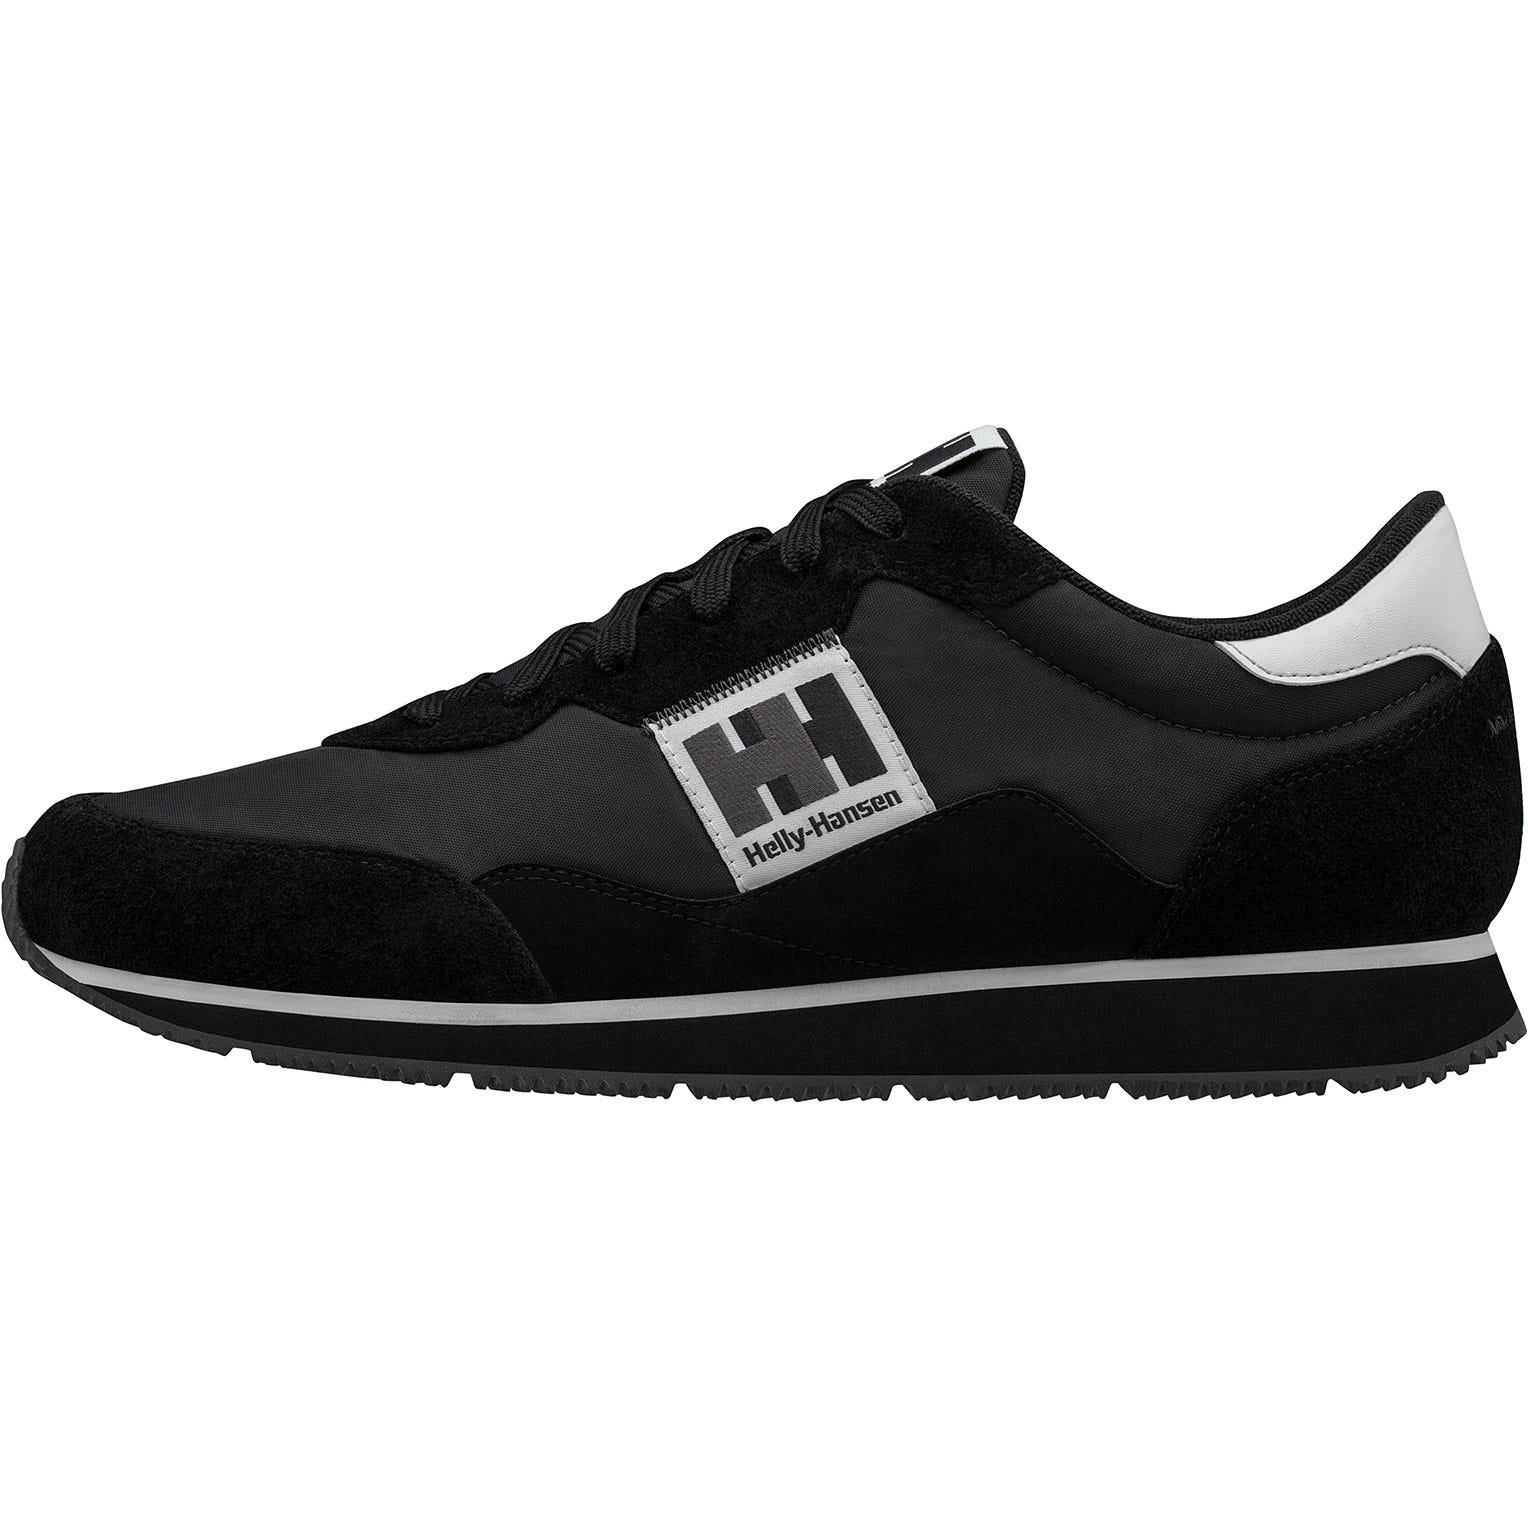 Helly Hansen Ripples Lowcut Sneaker Mens Black 48/13